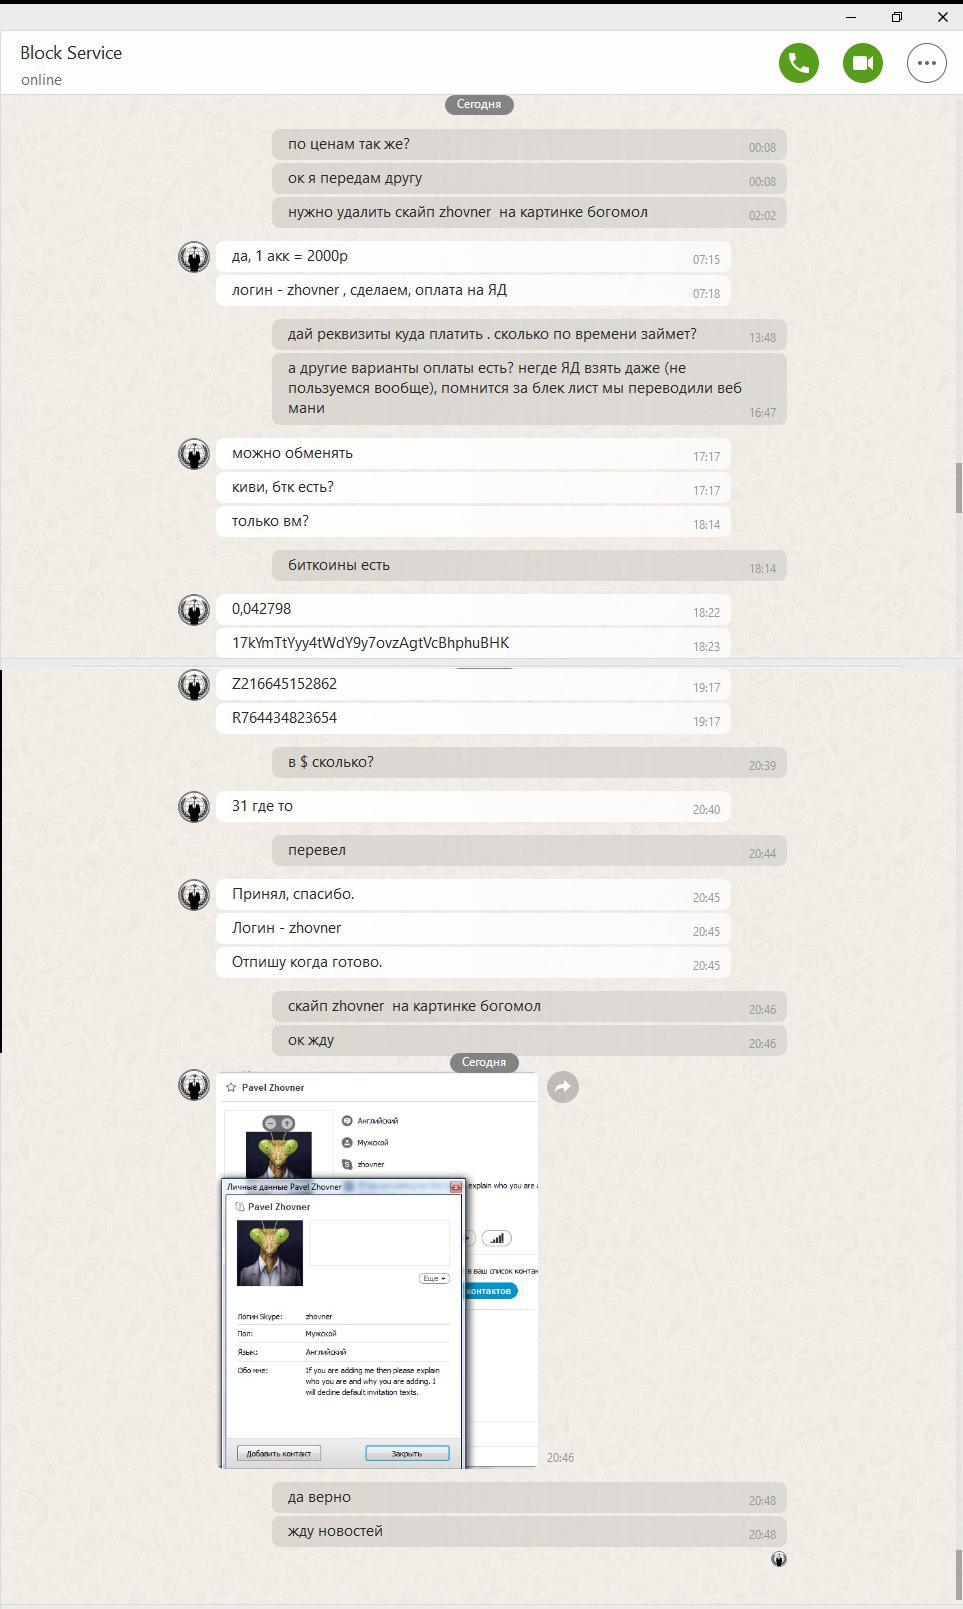 Как Skype уязвимости чинил - 6